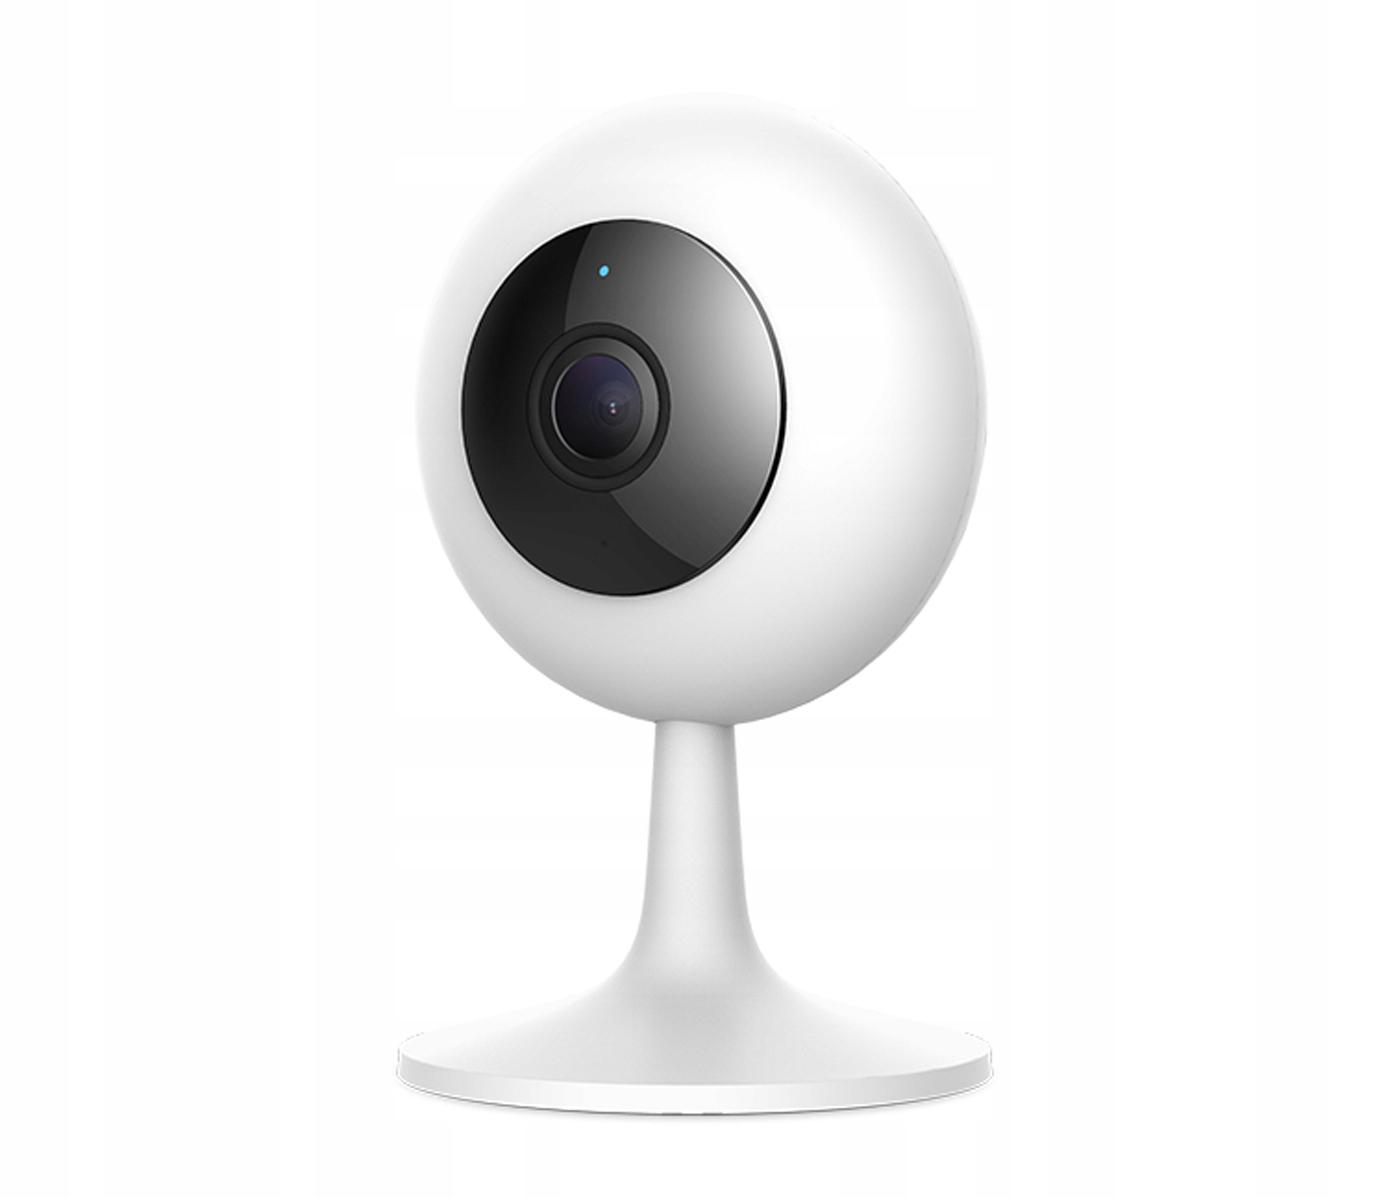 IMILAB MI HOME 1080p H.265 Kamera IP 64GB NIANIA